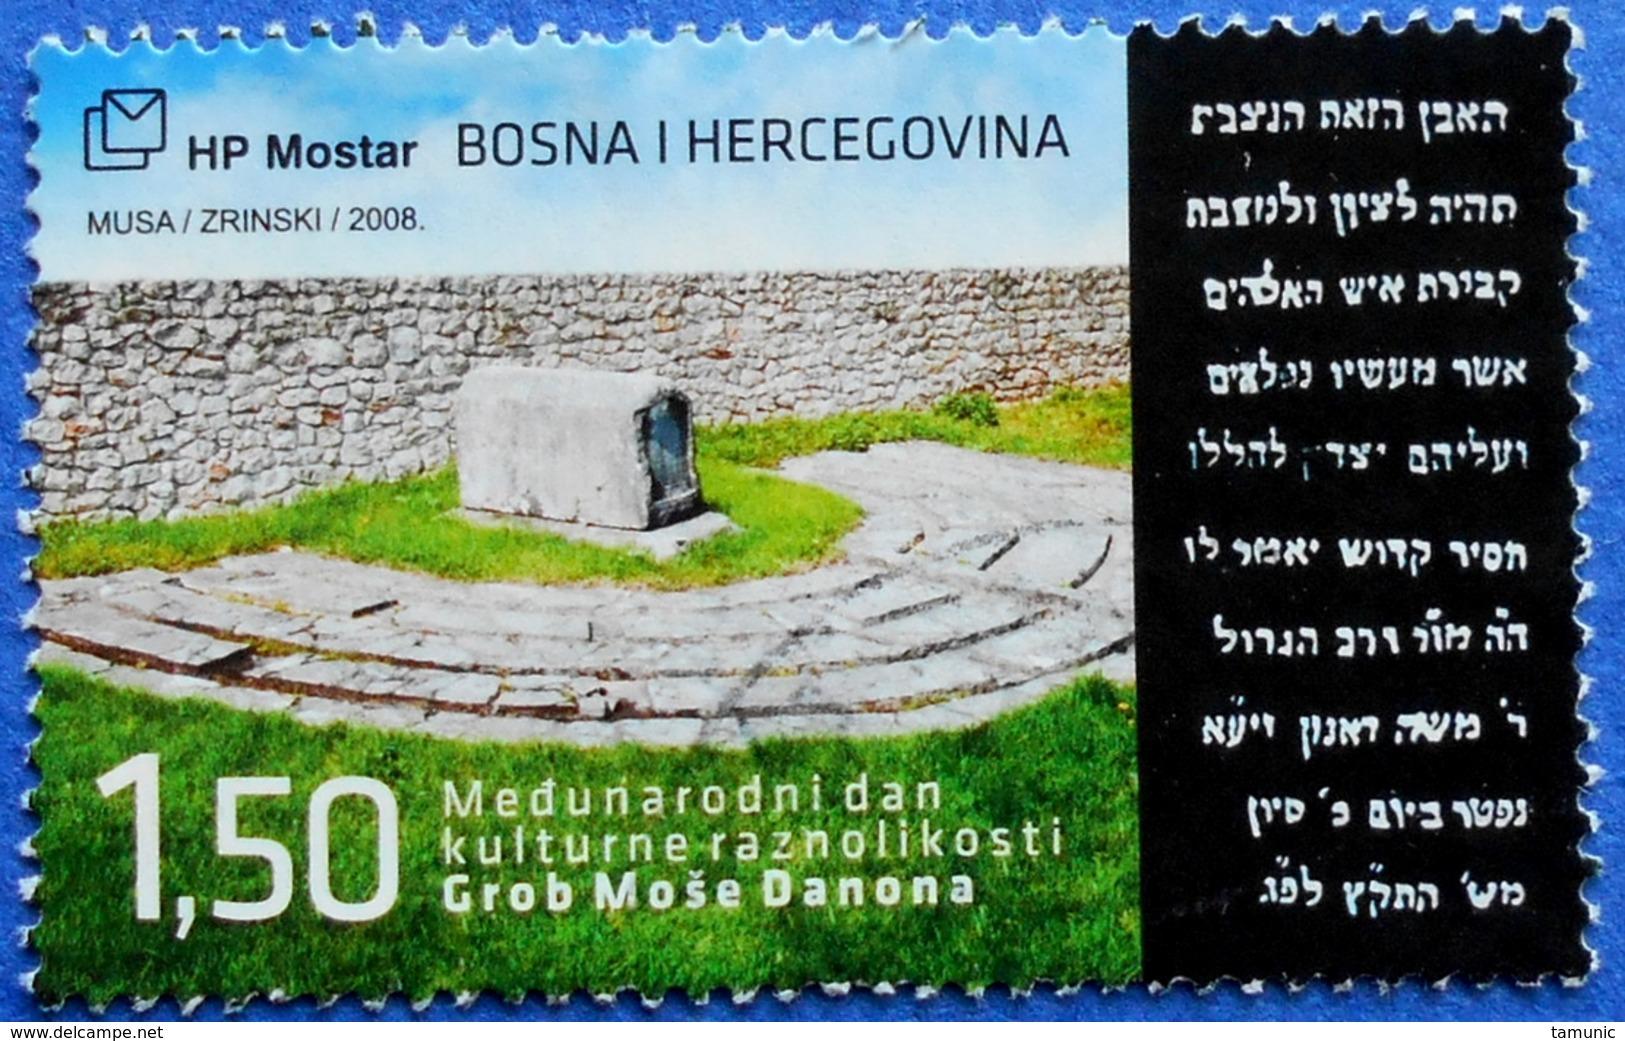 BOSNIA AND HERZEGOVINA CROATIA HP MOSTAR 1,50 KM 2008 TOMB OF MOSA DANON M.229 - USED - Bosnie-Herzegovine